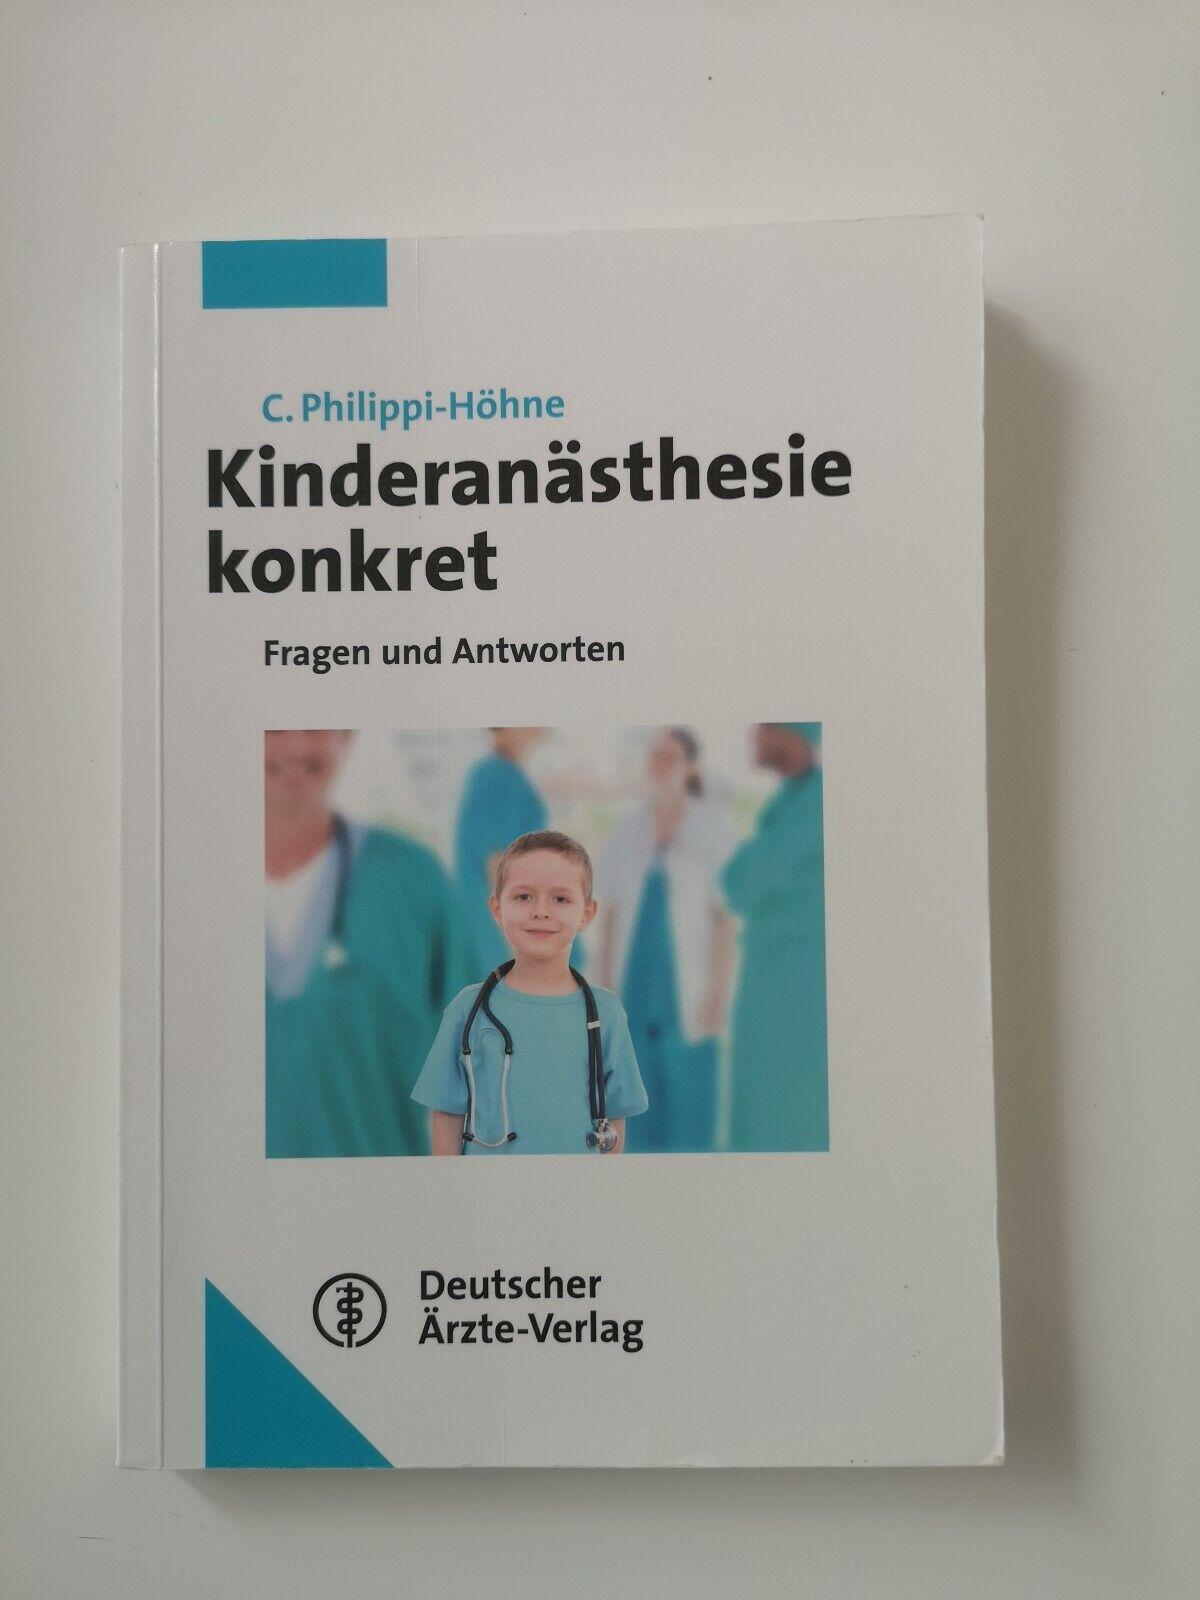 Kinderanästhesie konkret Philippi-Höhne anästhesie Pädiatrie Fachbuch Lehrbuch